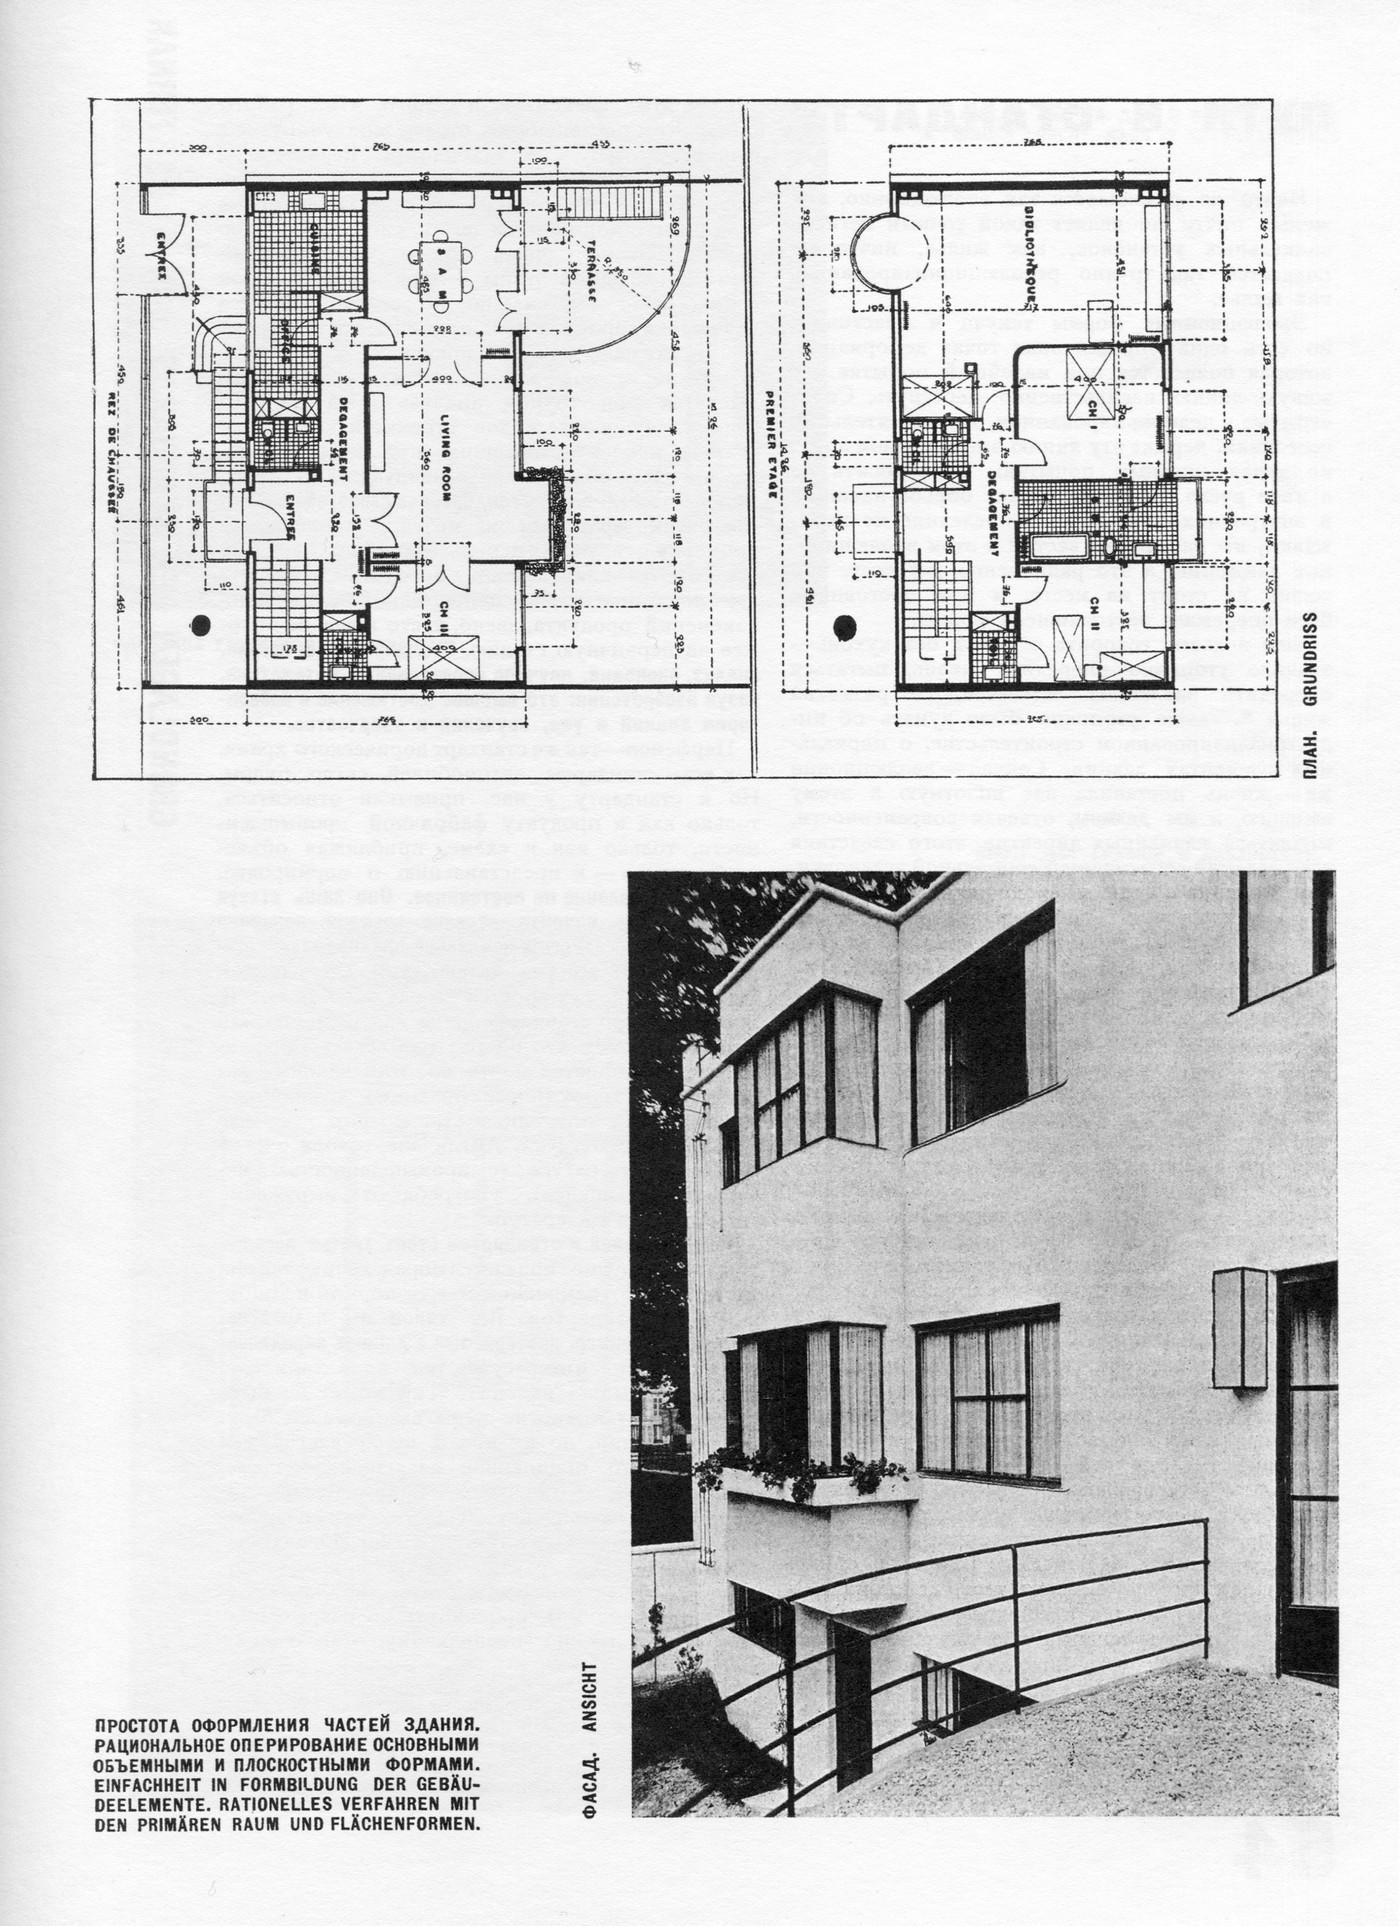 tehne.com-sa-1927-2-1400-009